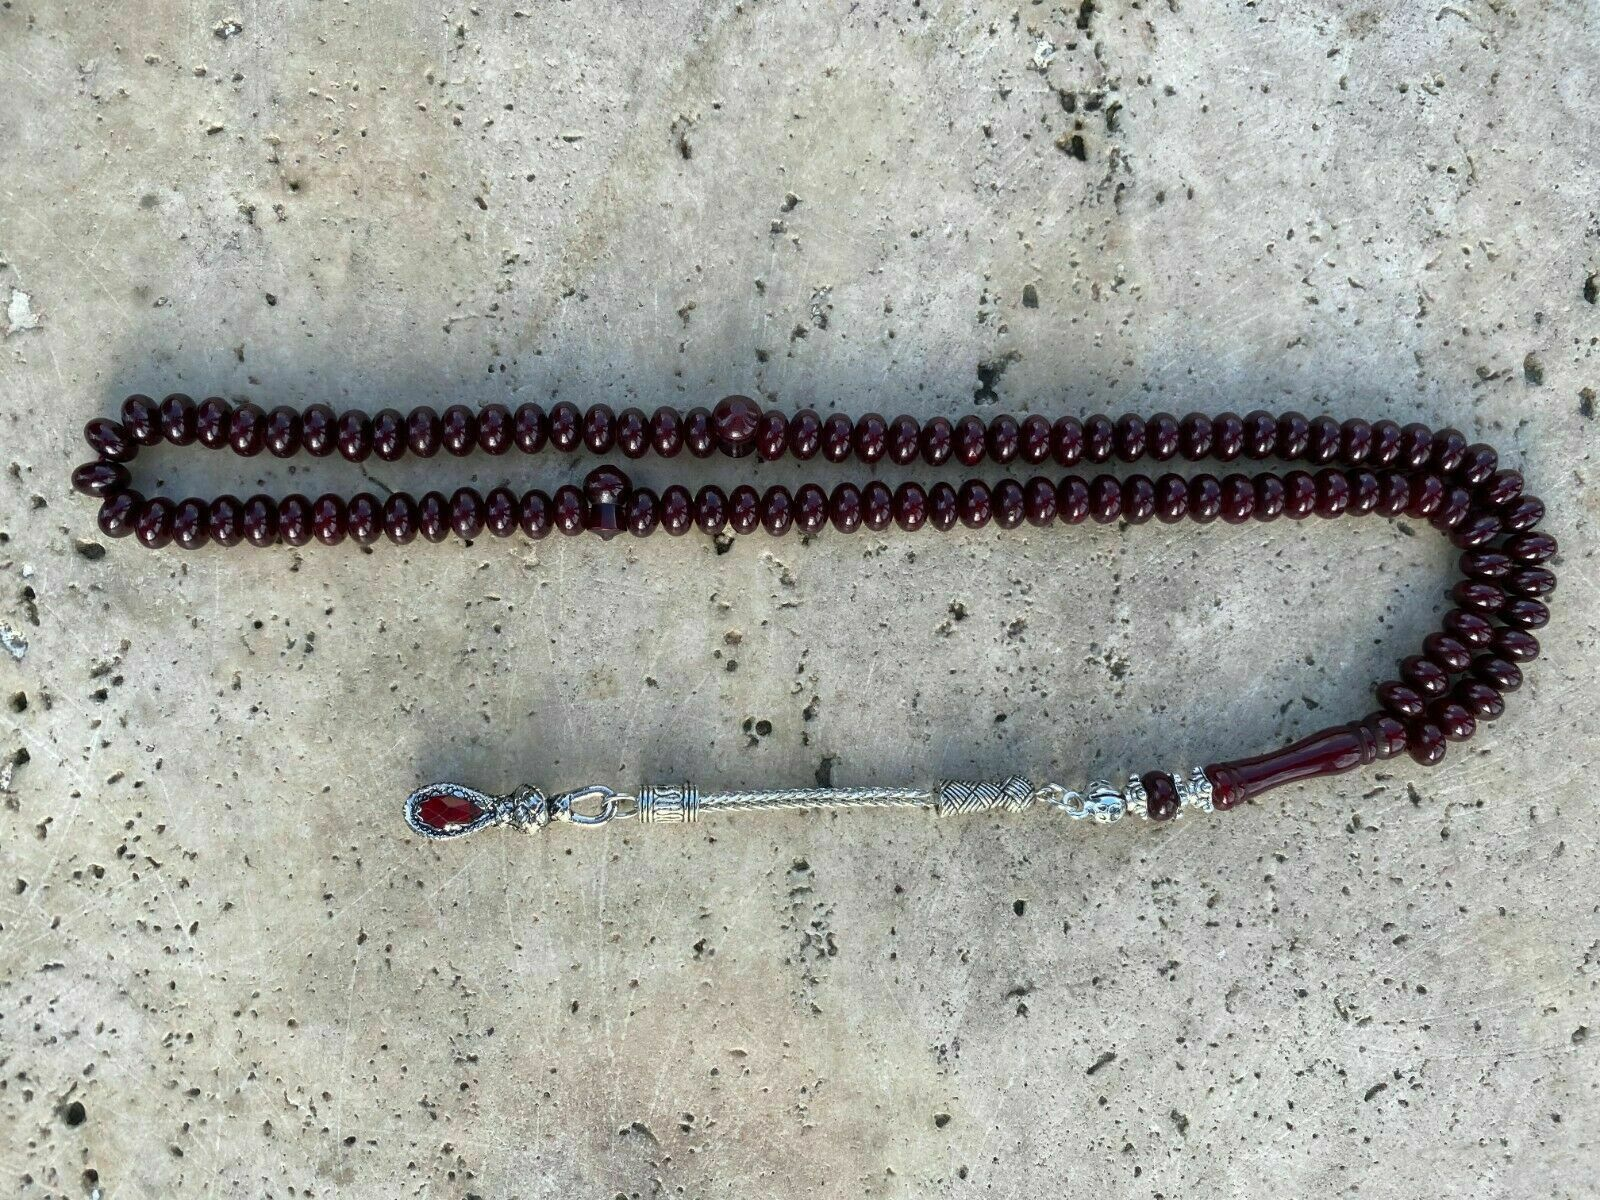 Ottoman Faturan German Amber Sandalous Misbaha Prayer Beads Islamic Gift Tasbih Tasbeeh Tasbeh Rosary Tasbih # 18E